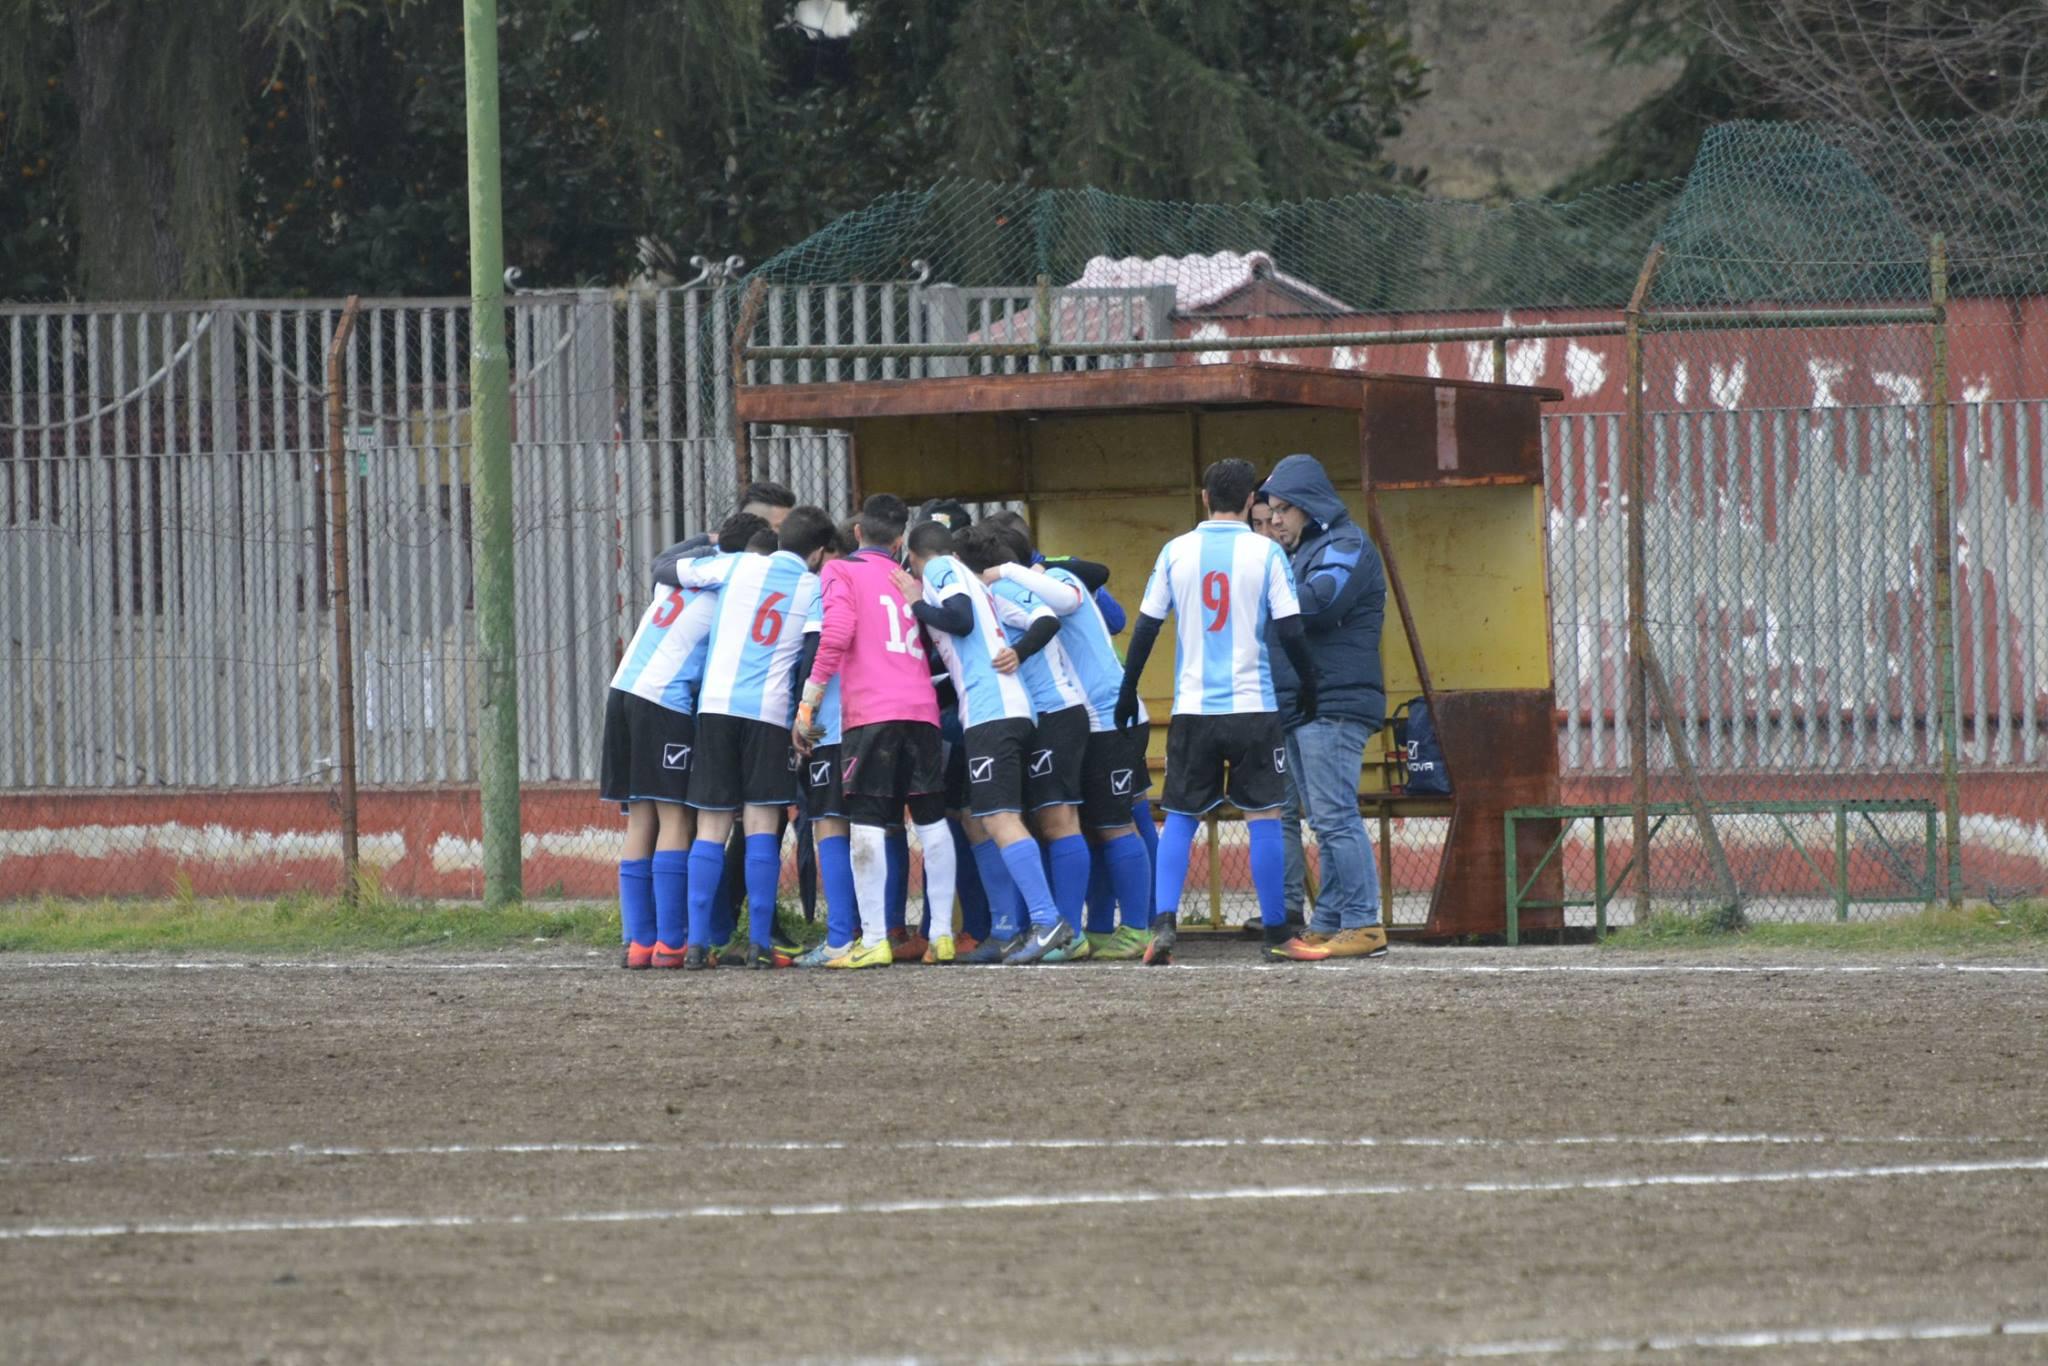 Juniores regionale: Hermes Casagiove – Real Albanova 2-4